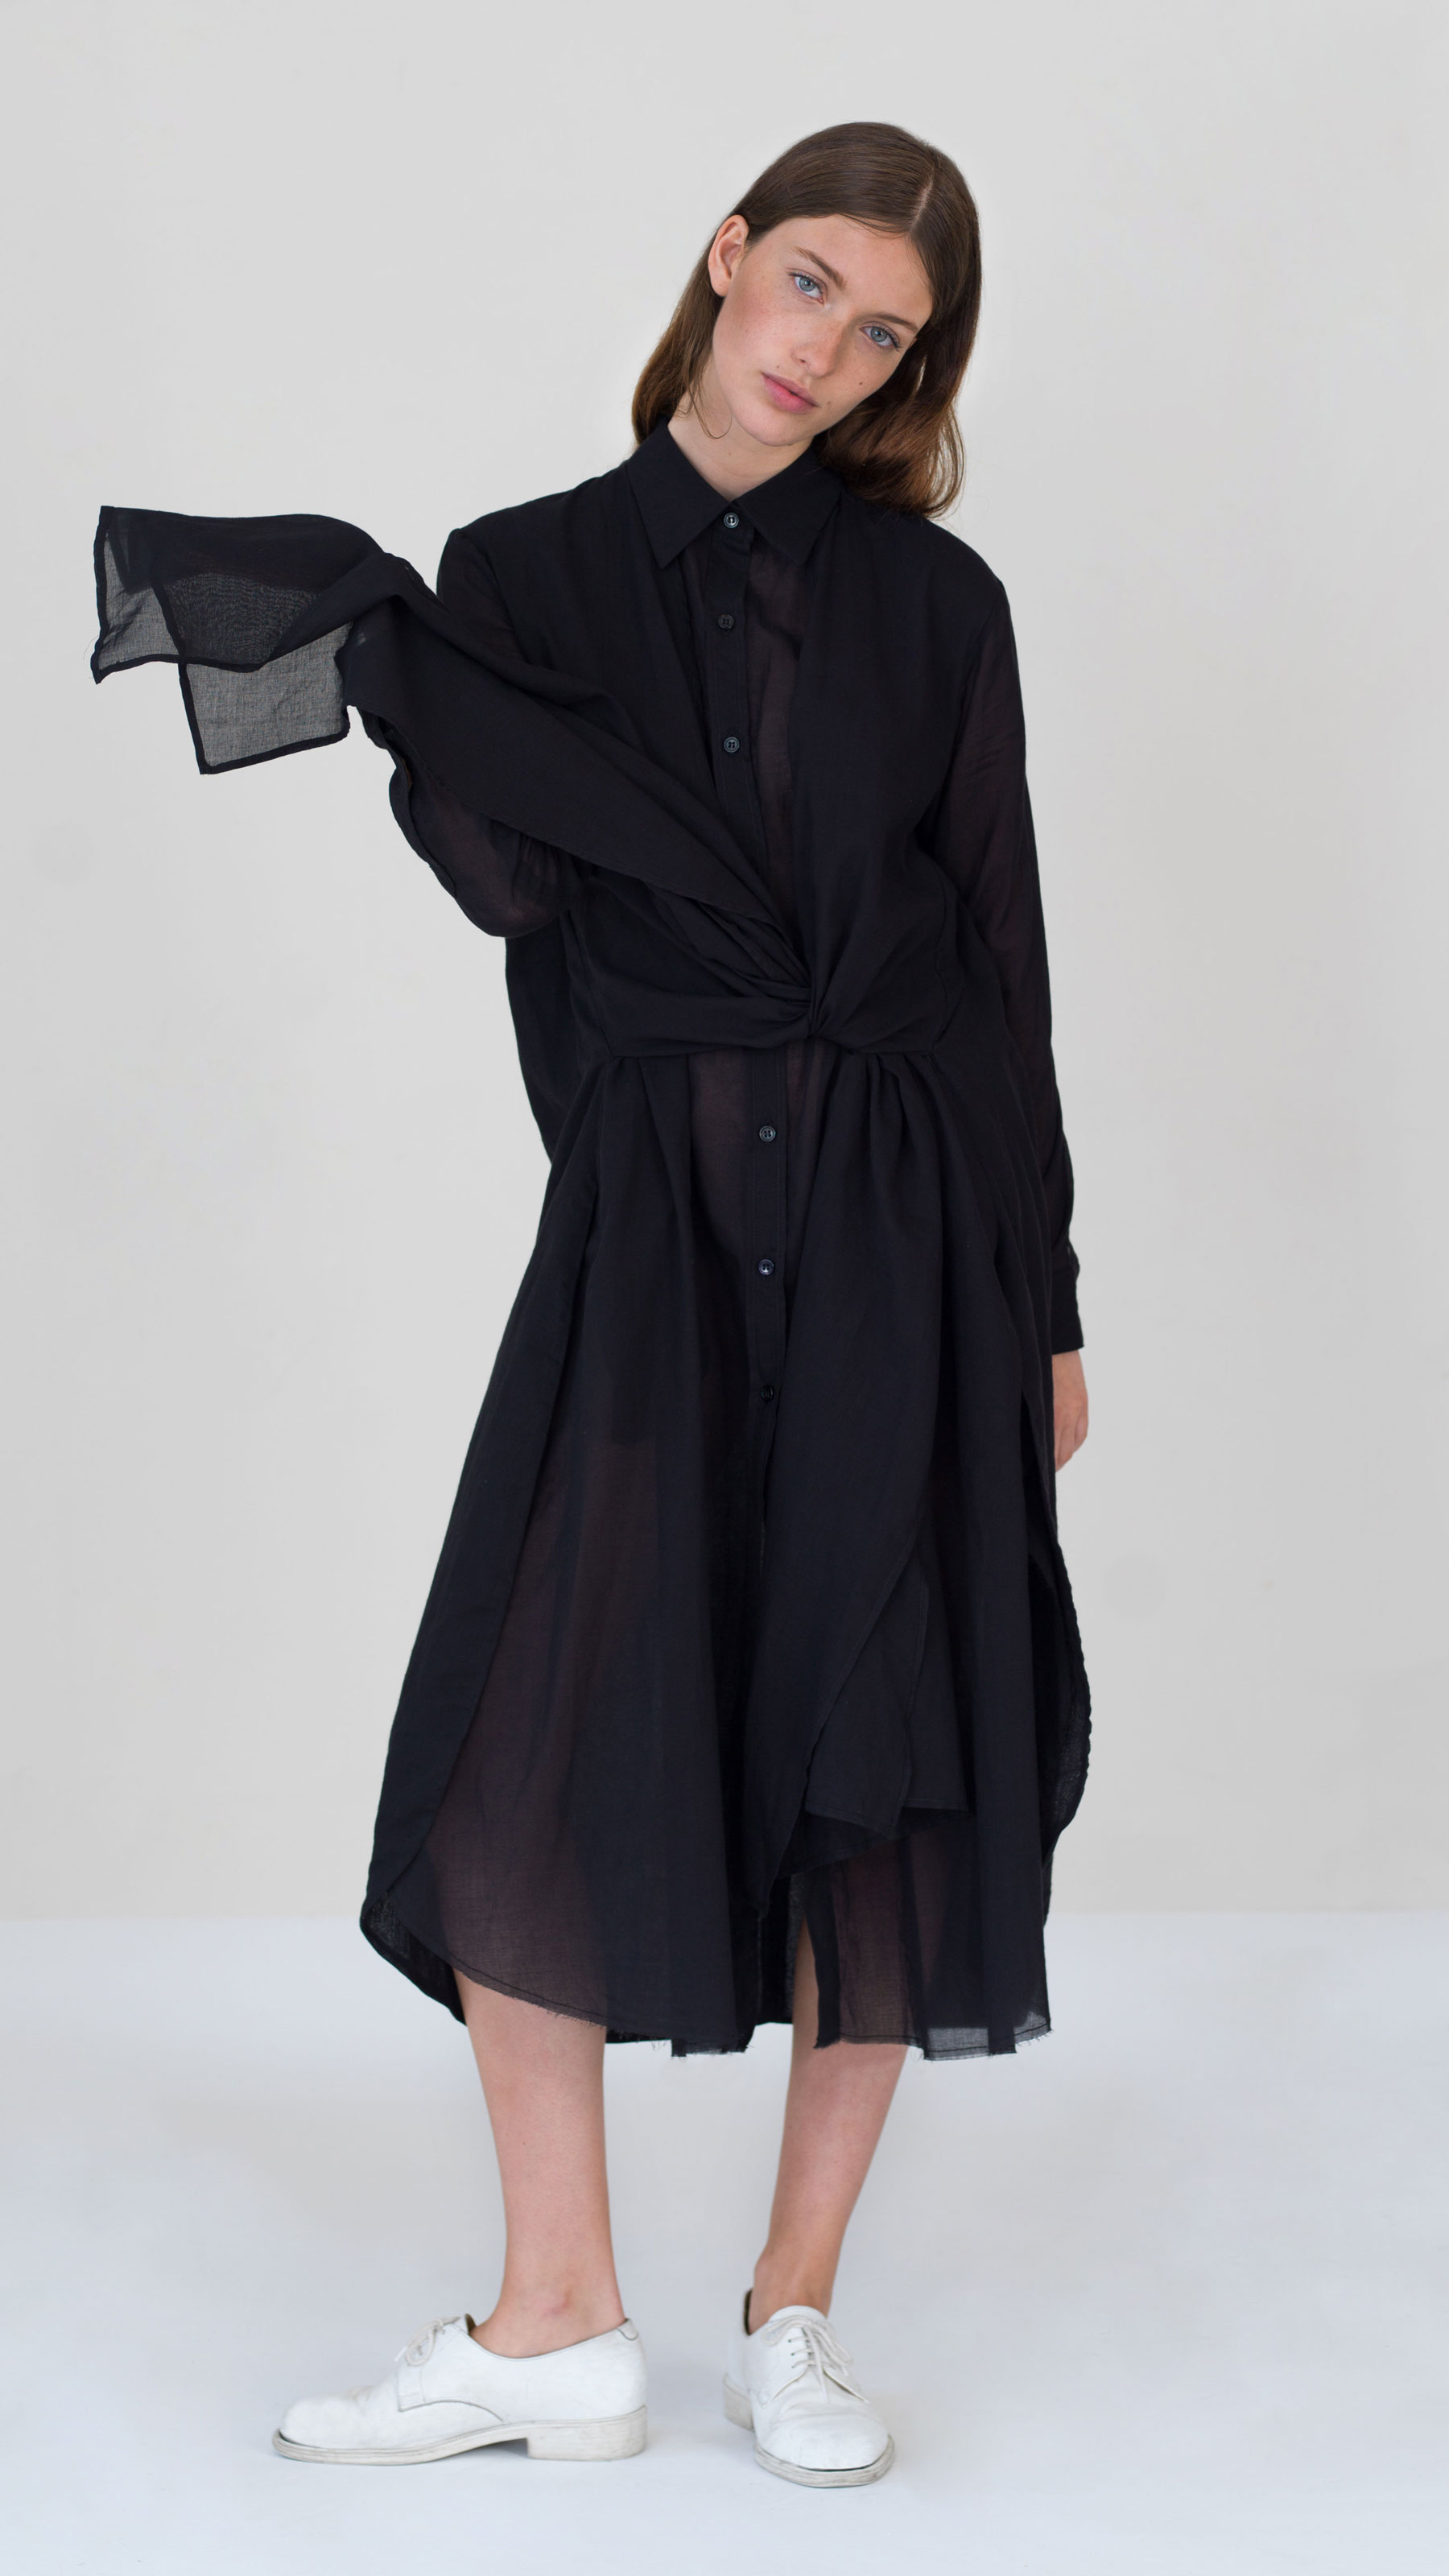 DADA_DIANE_DUCASSE_Dress_Shirt_Knotted_Black_1